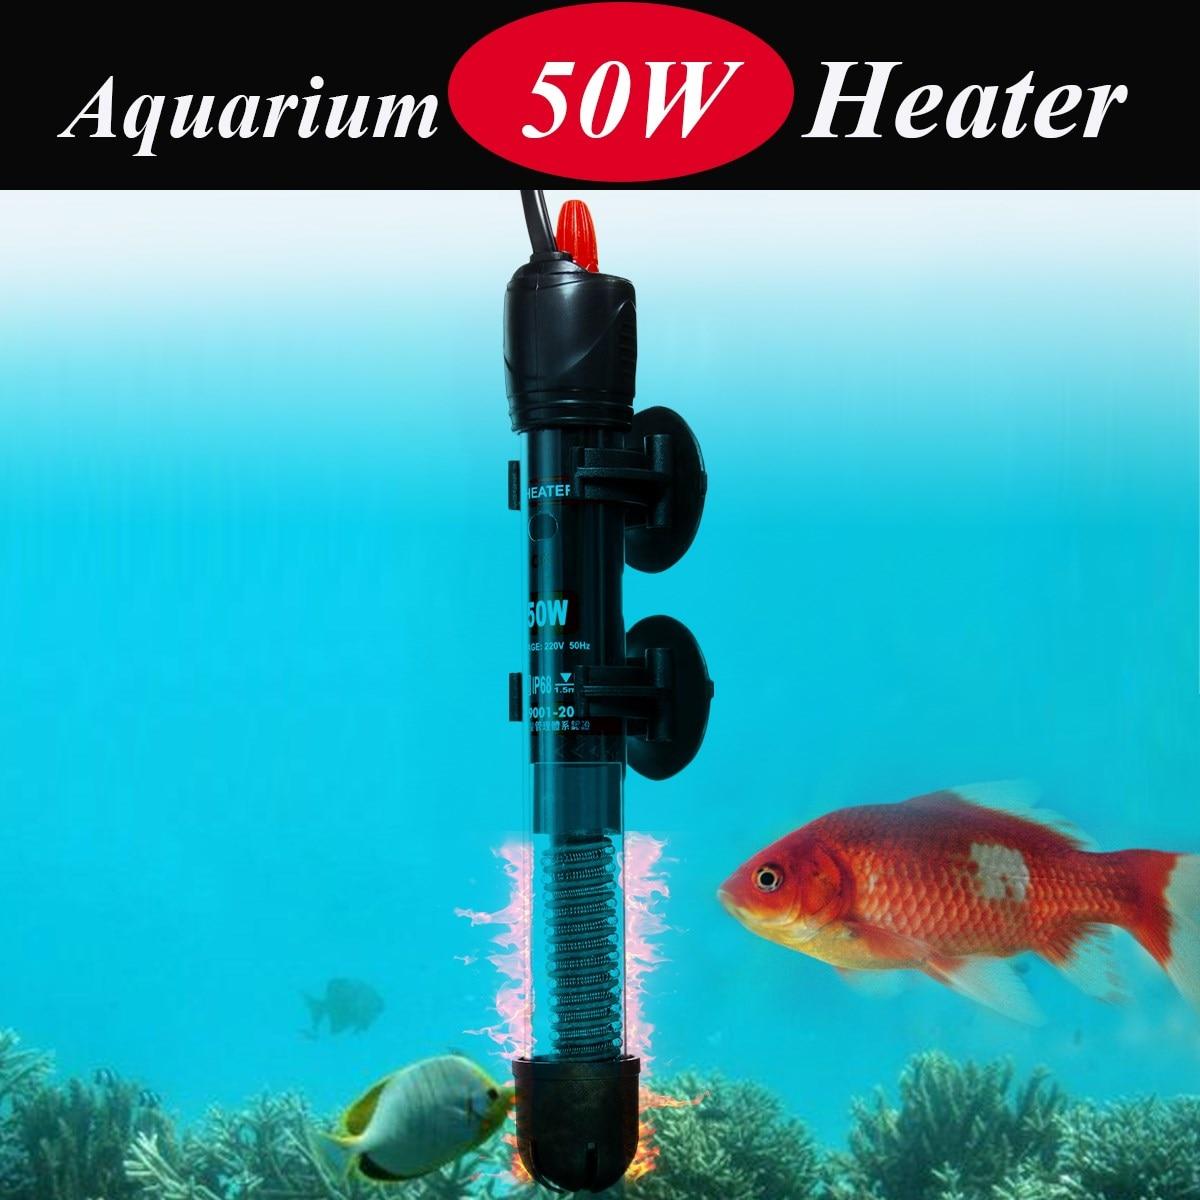 50W/100W/200W/300W Submersible Aquarium Fish Tank Water Heater Automatic Adjustable Temperature Heating Device Heater Tank50W/100W/200W/300W Submersible Aquarium Fish Tank Water Heater Automatic Adjustable Temperature Heating Device Heater Tank